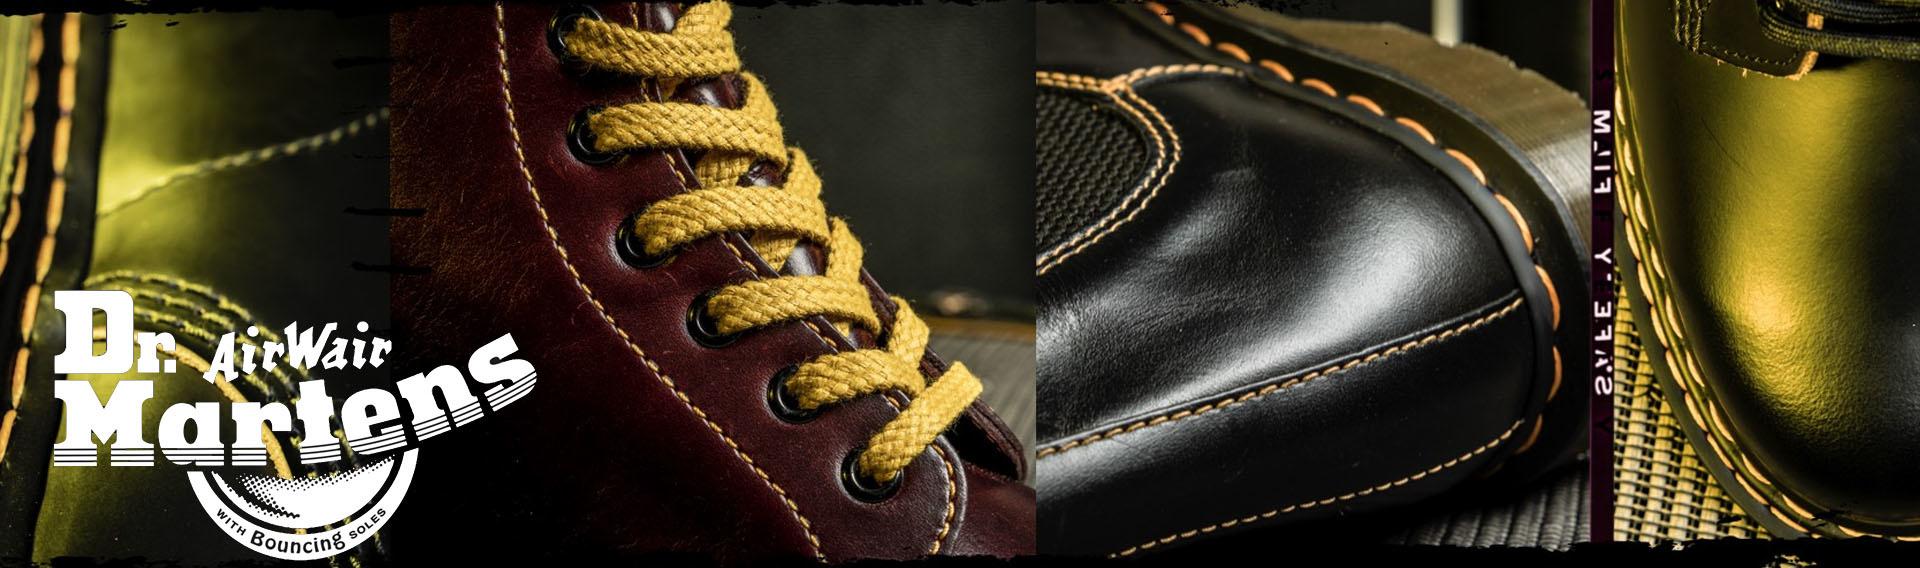 Dr.Martens schoenen